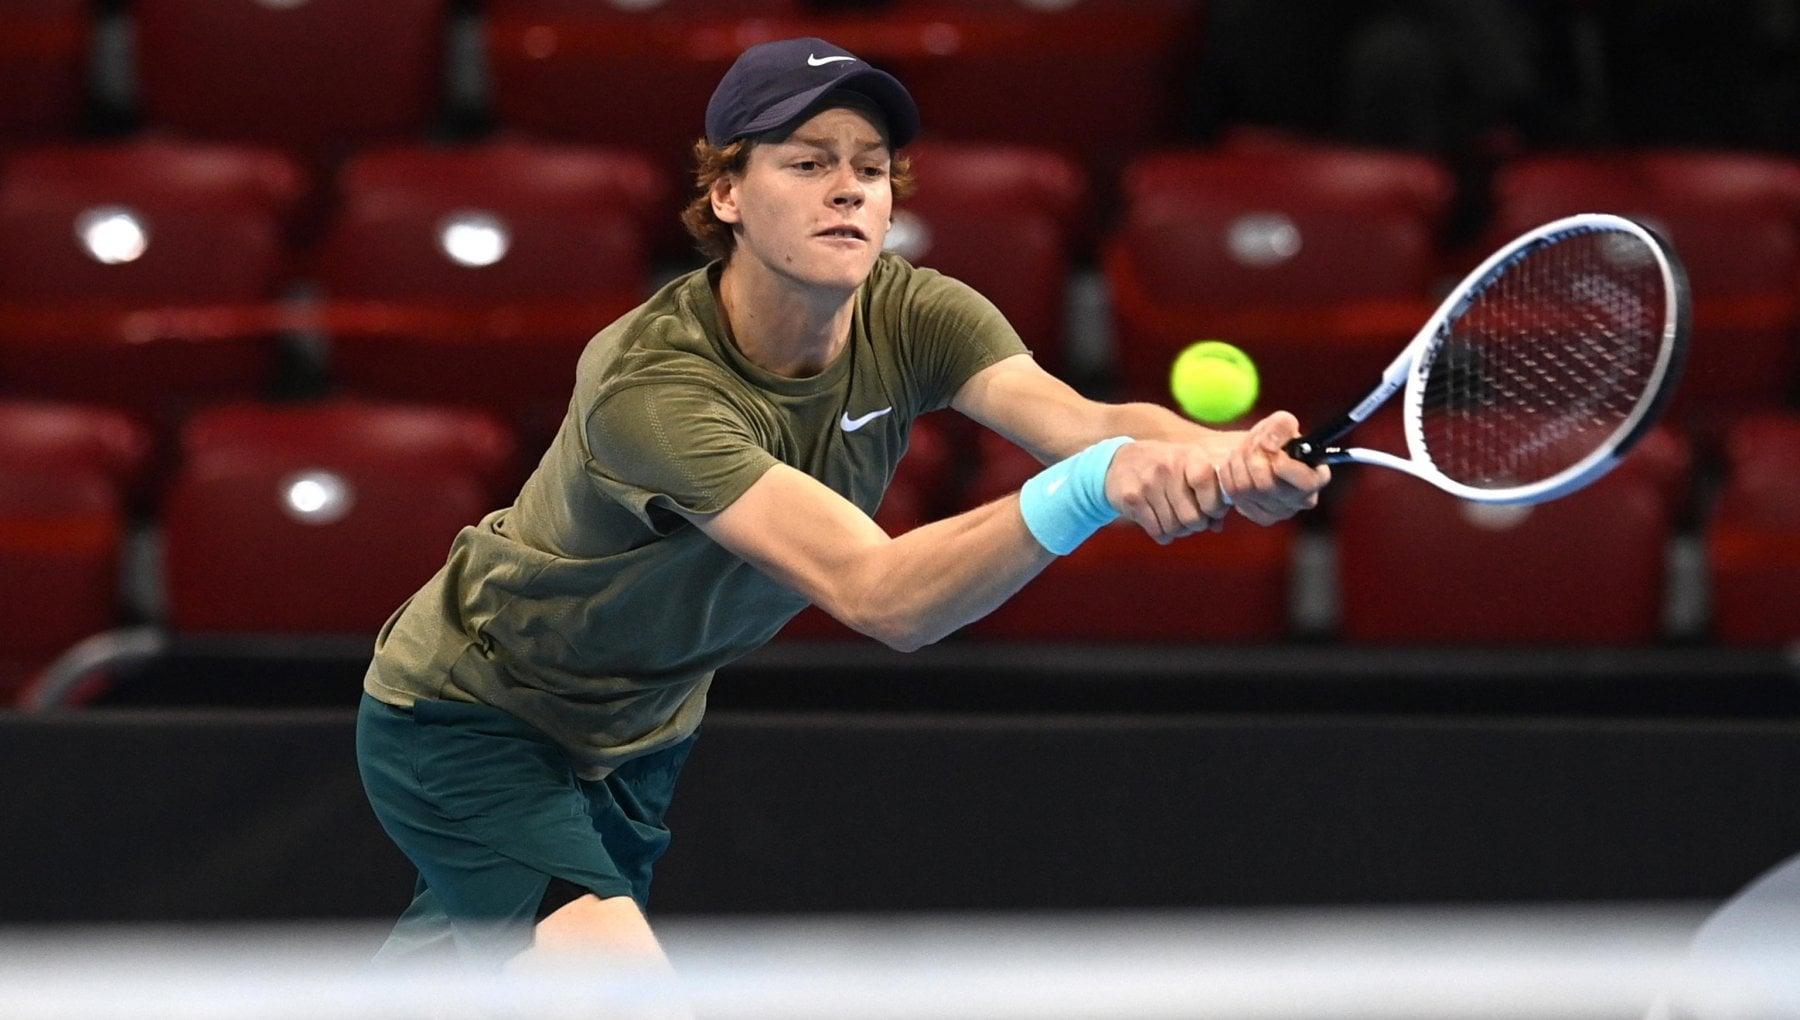 Tennis primo trionfo di Sinner in carriera battuto Pospisil in finale a Sofia